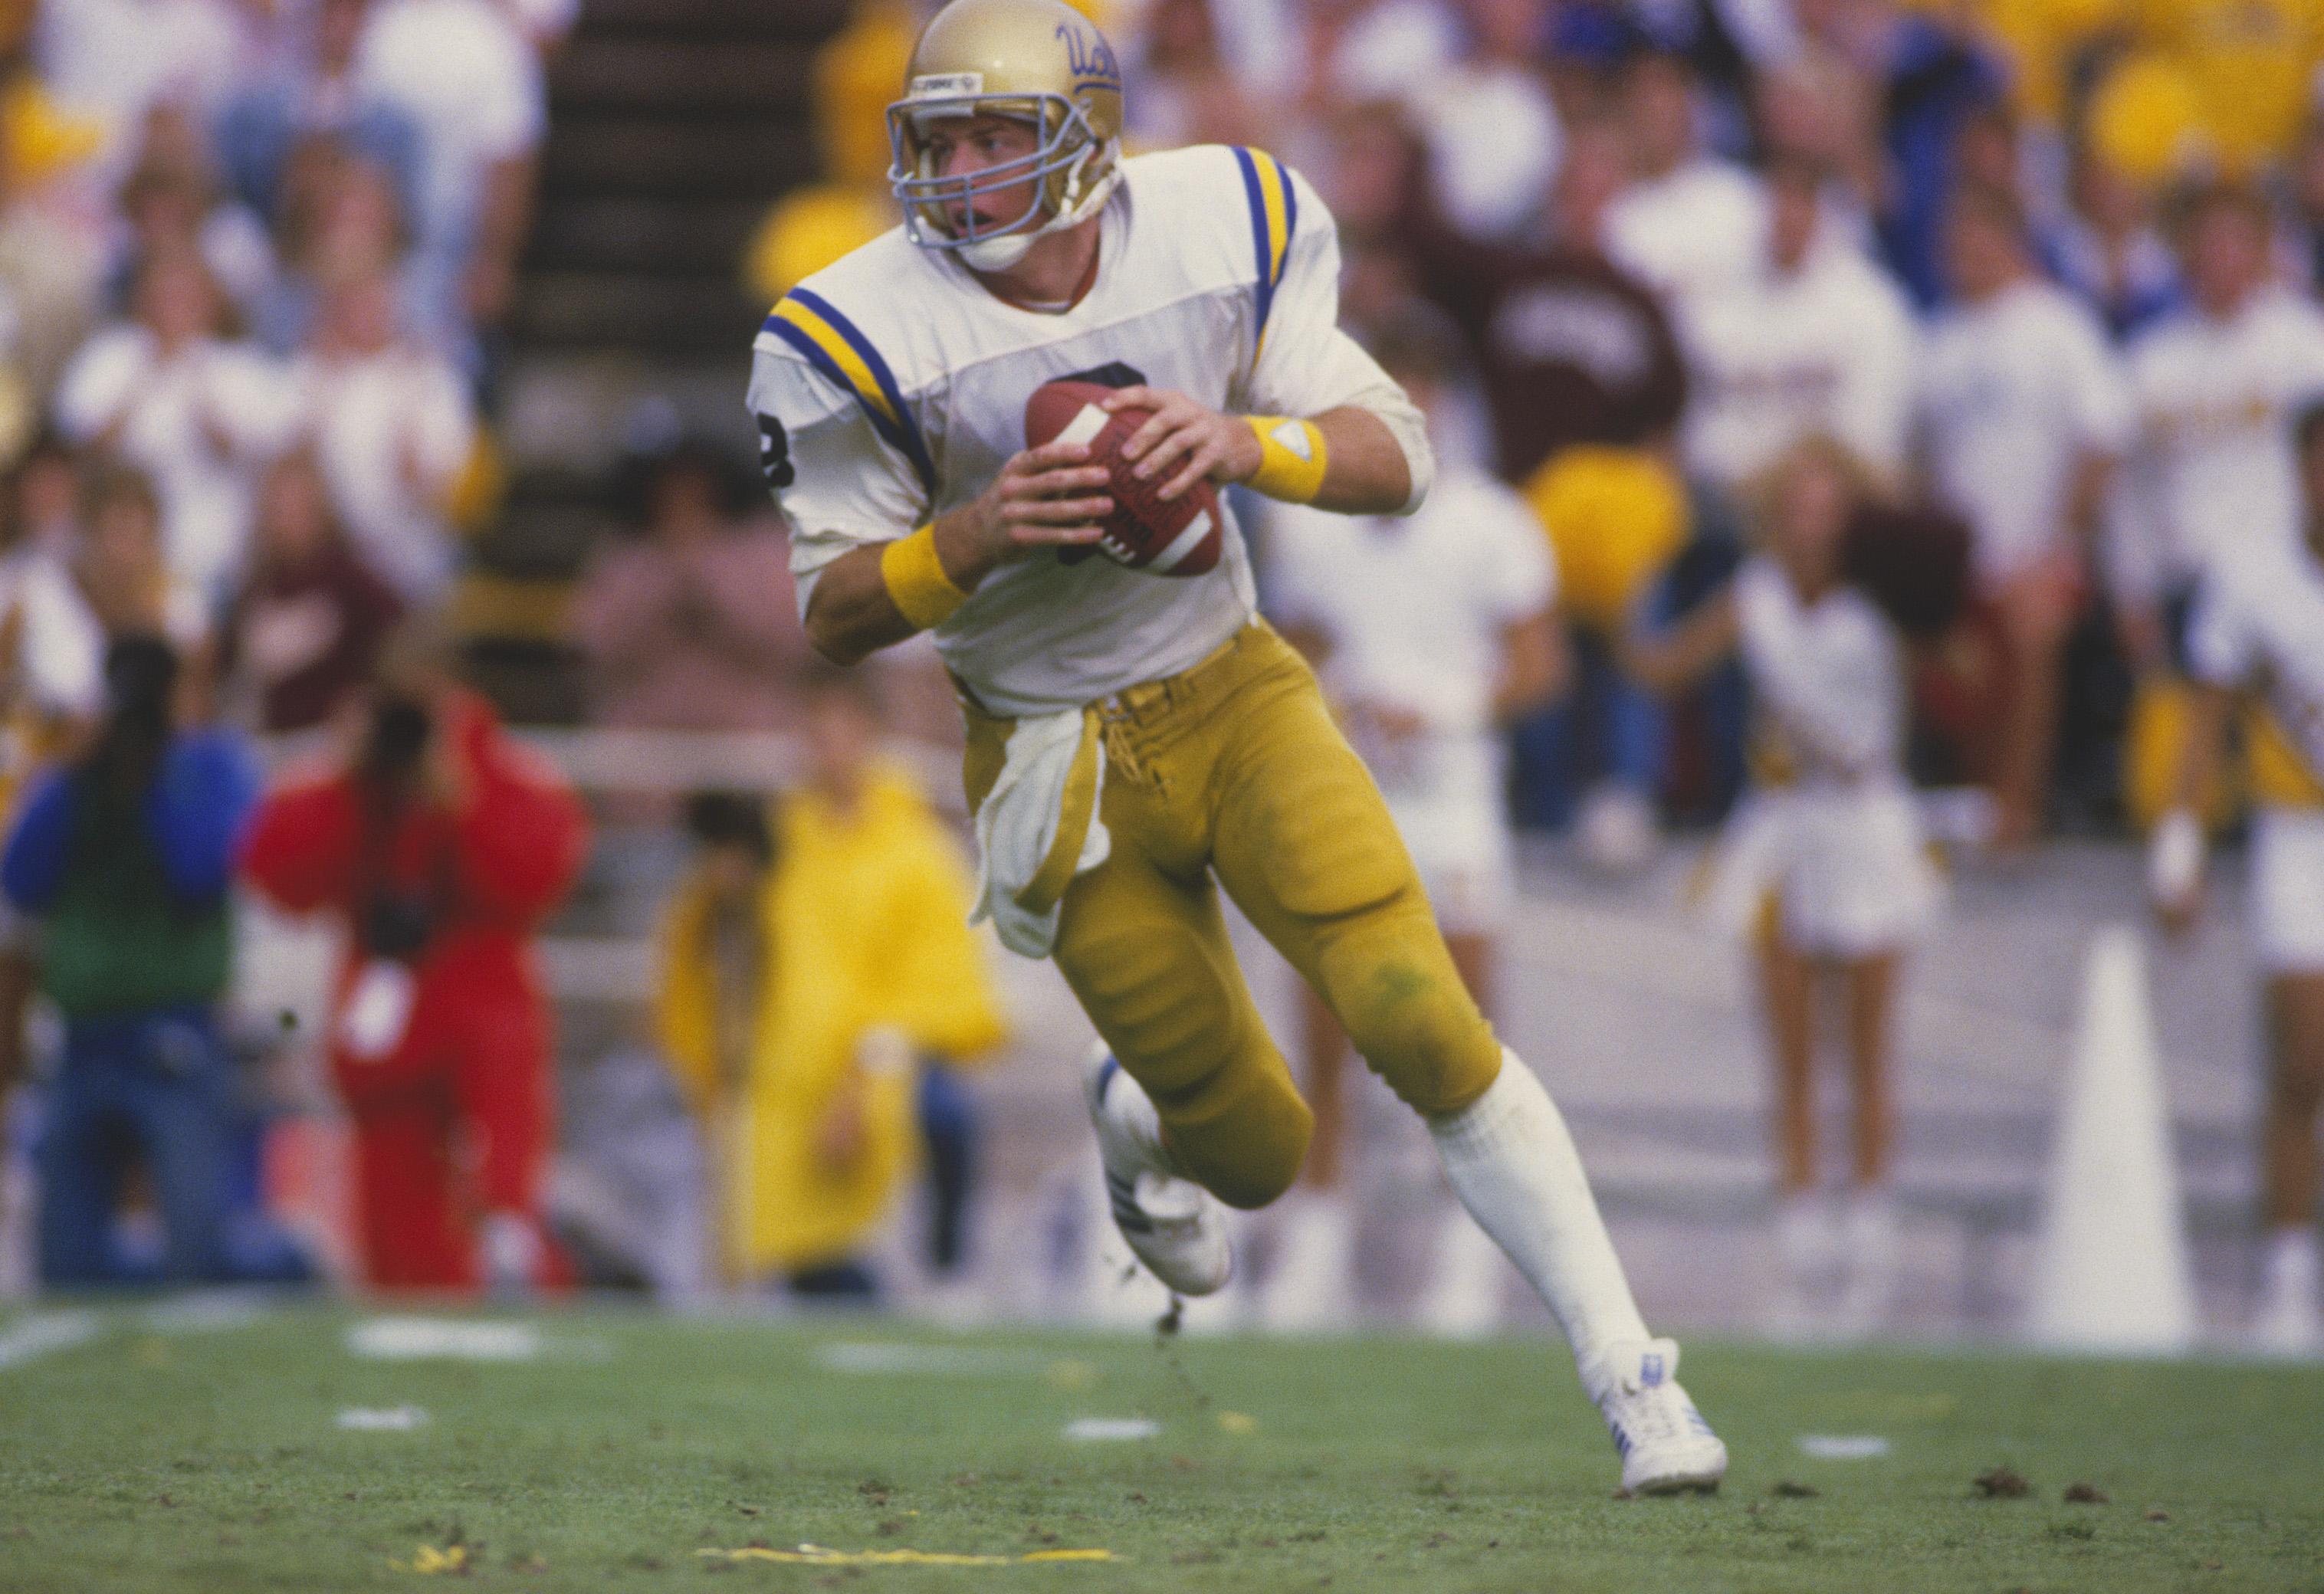 UCLA quarterback Troy Aikman runs with the ball